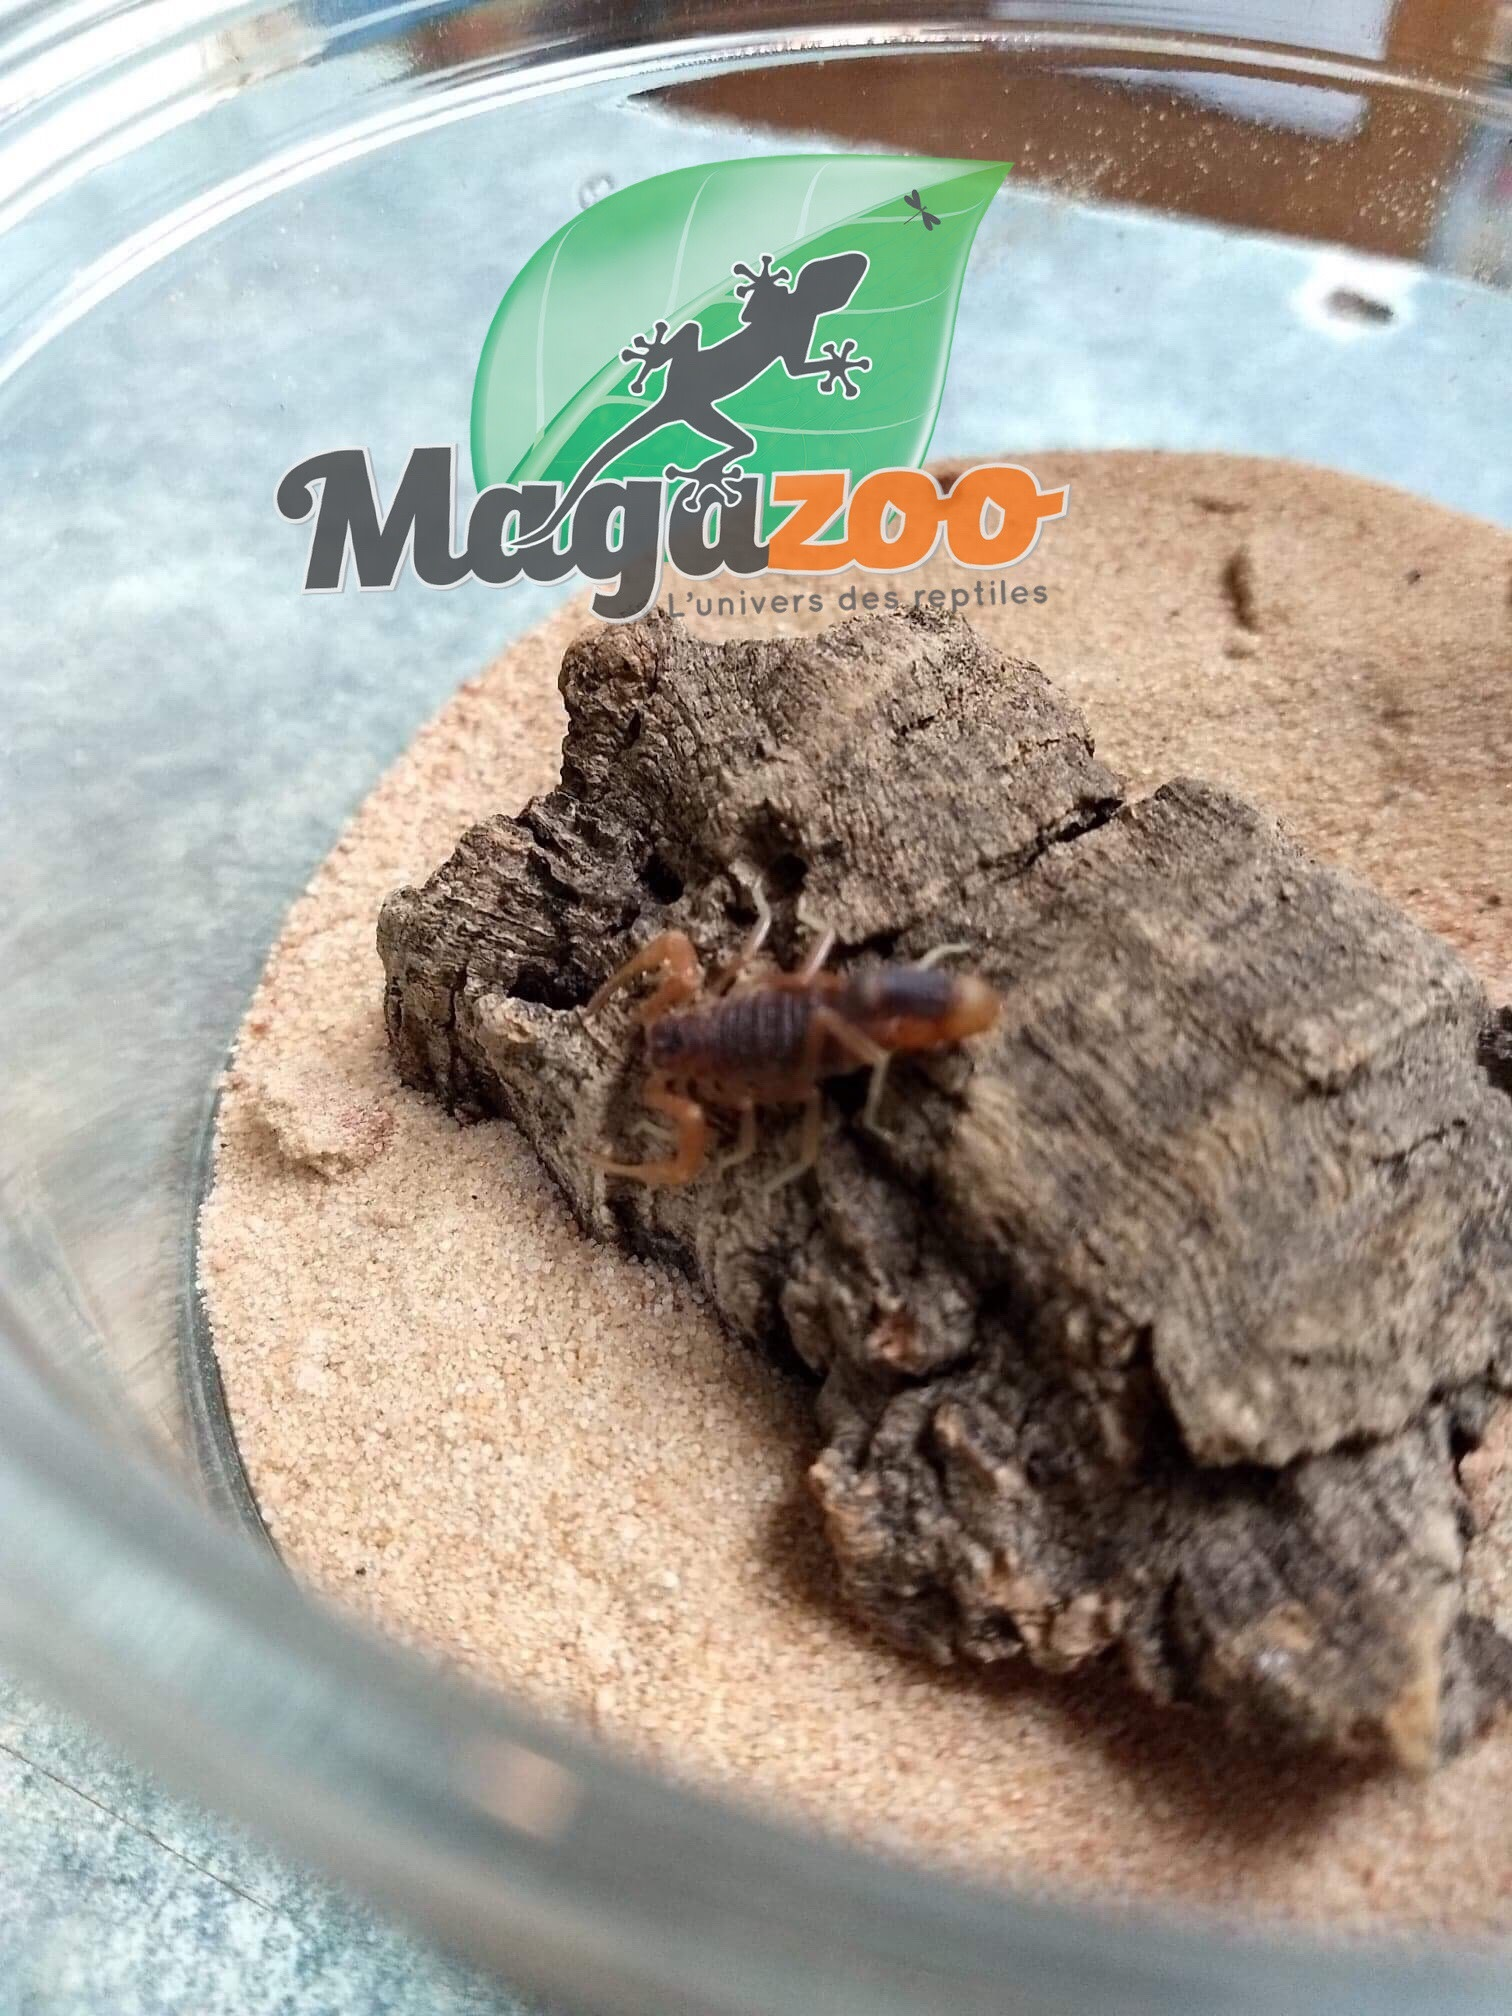 Magazoo Scorpion de Tanzanie/Parabuthus maximus (mâle)